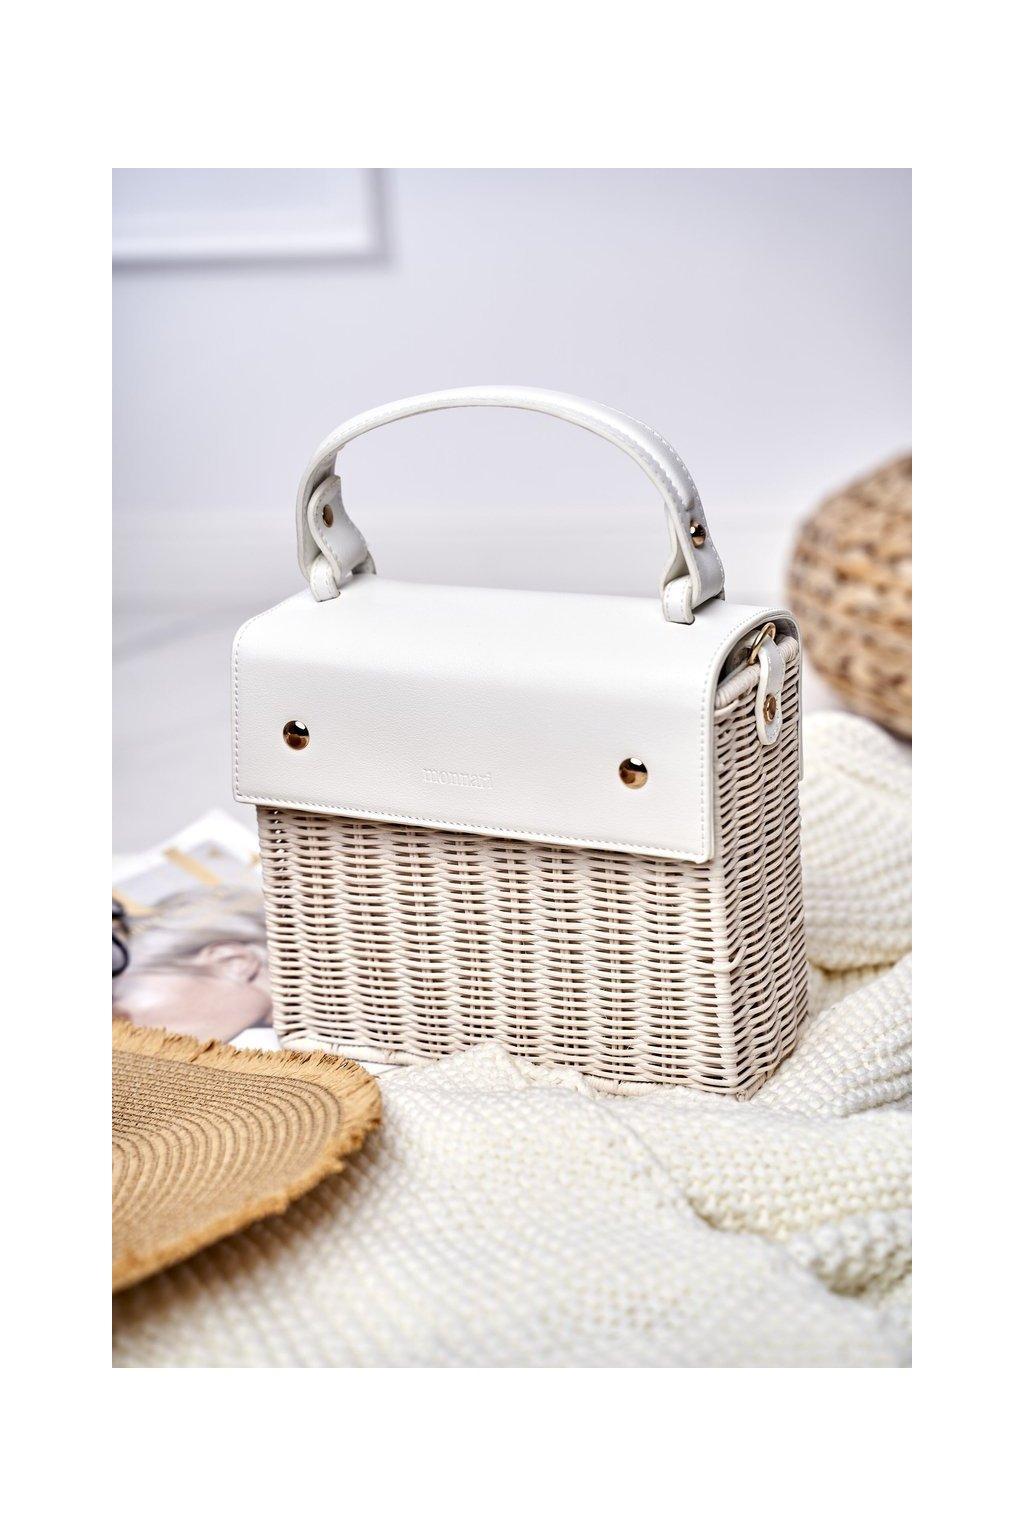 Dámska Kabelka Monnari biela BAG3660-000